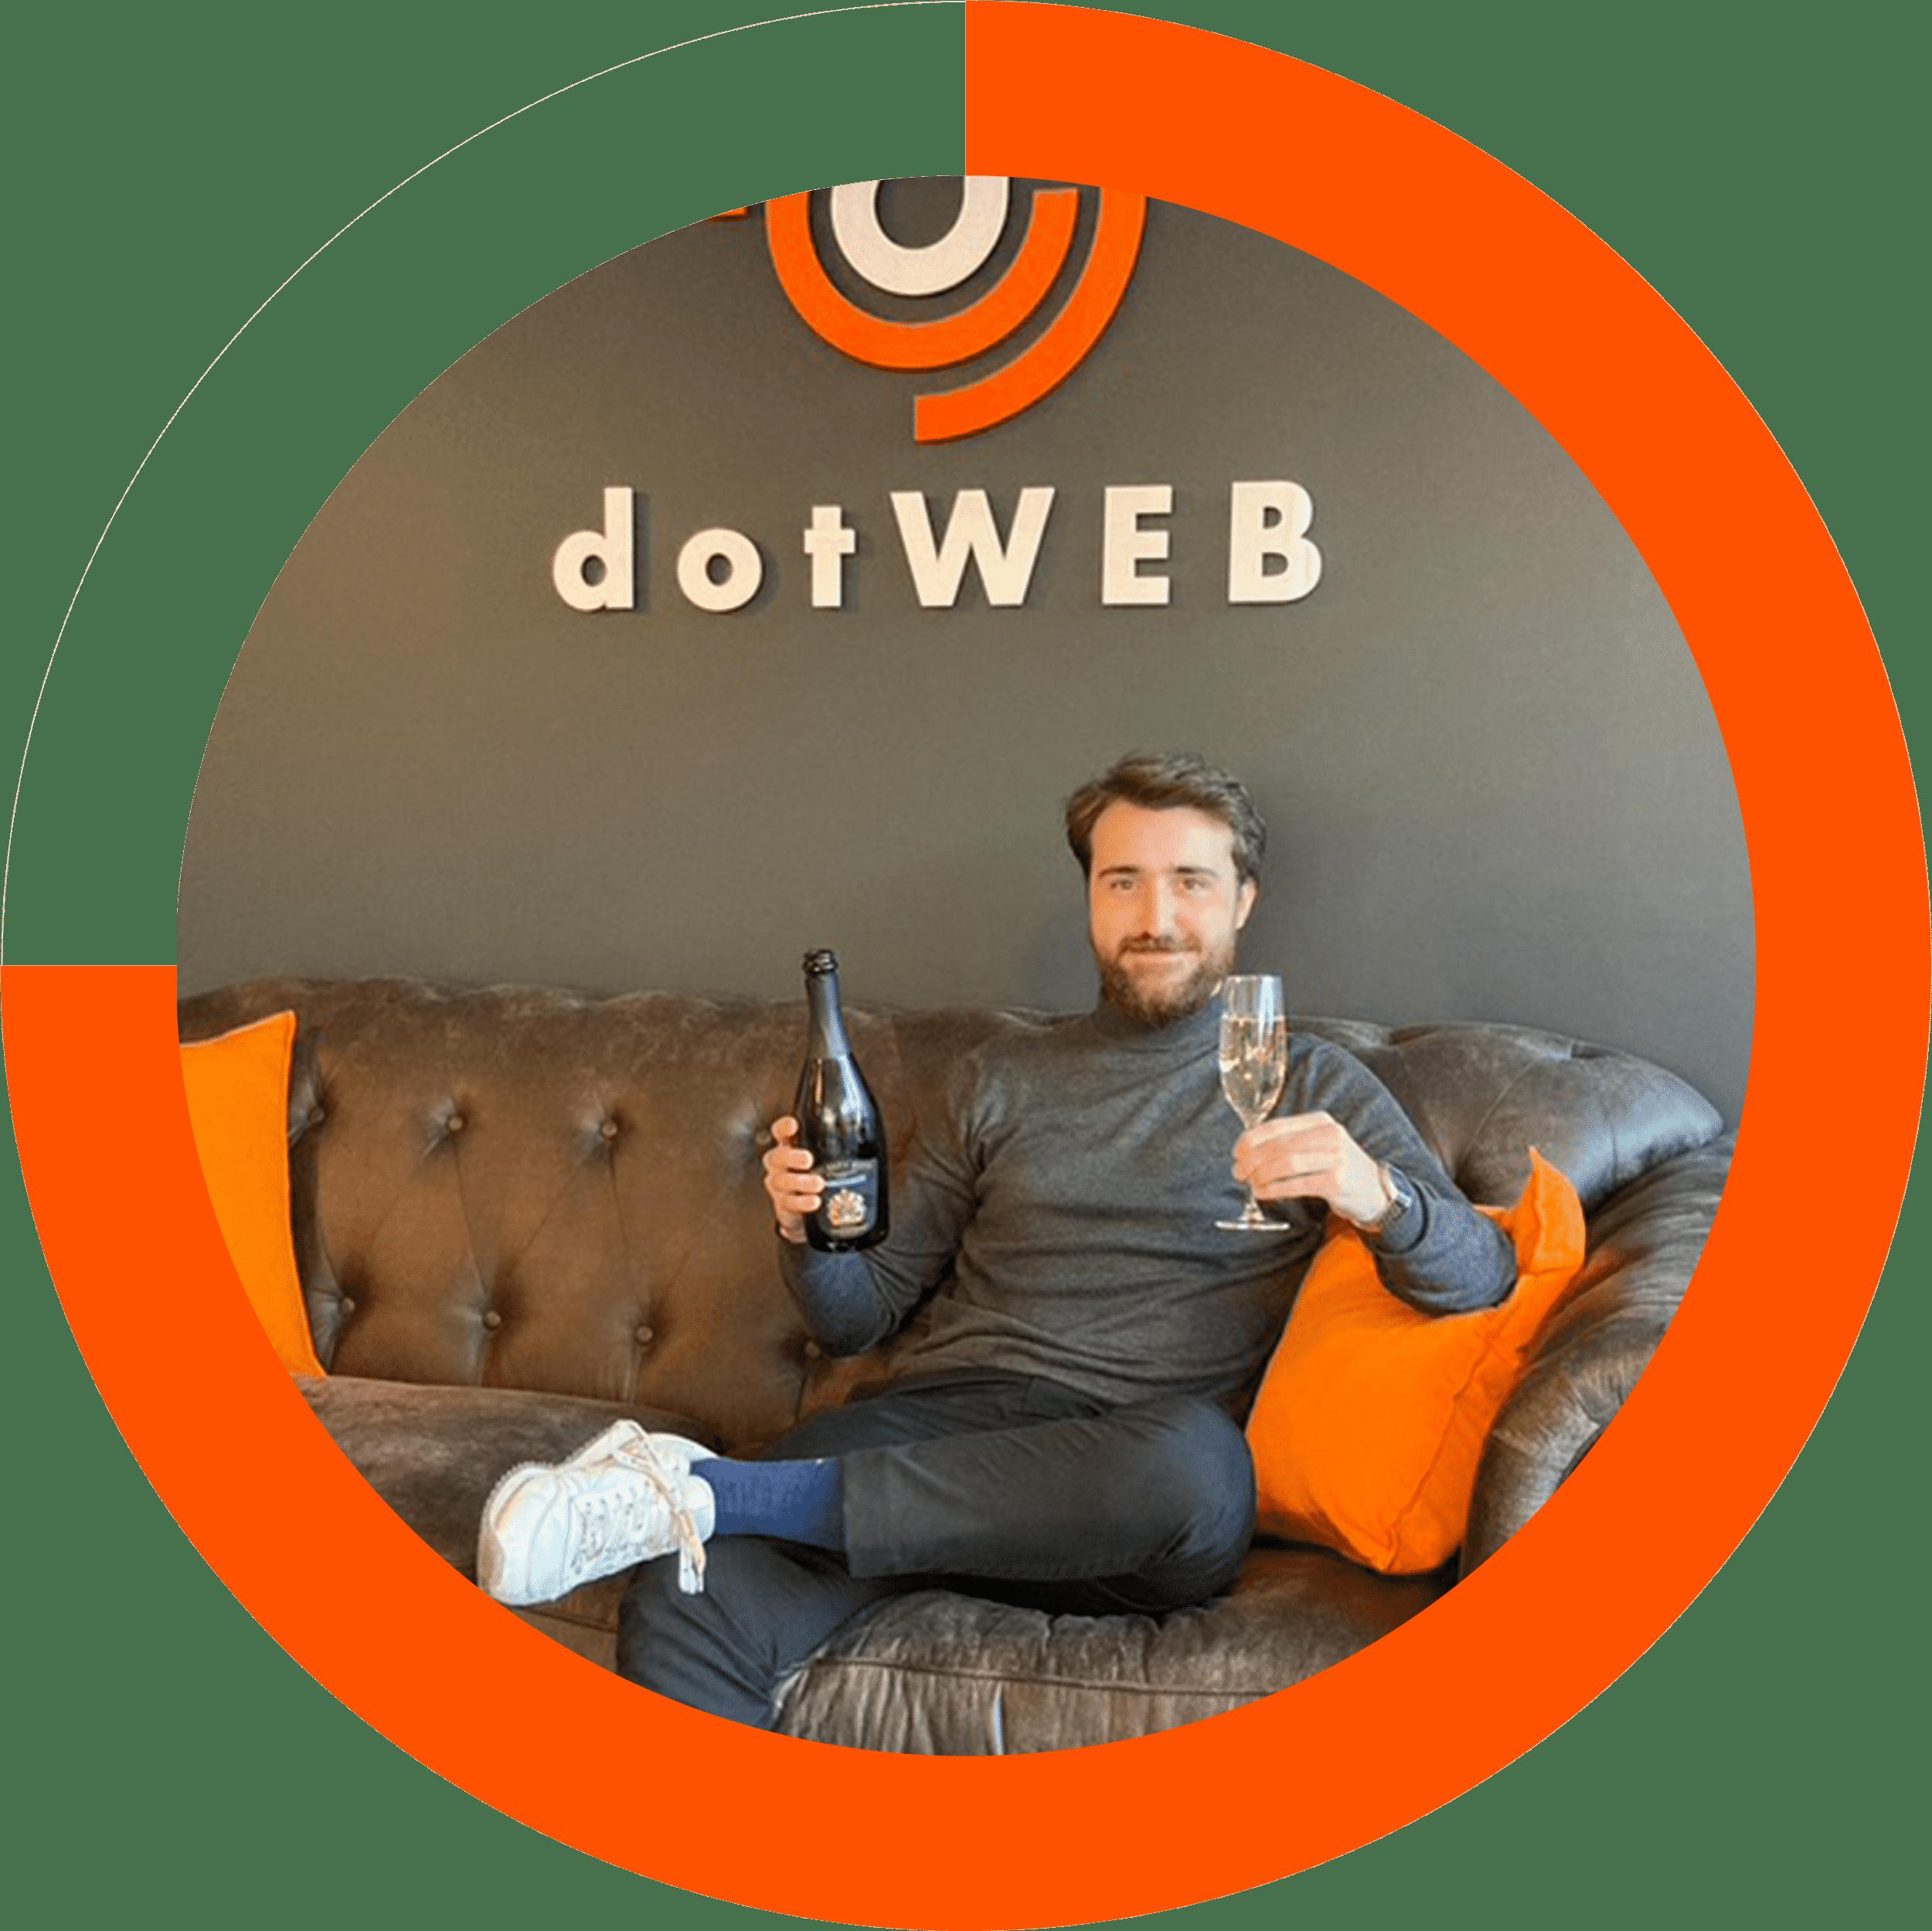 dotweb marketing Koen Bettens